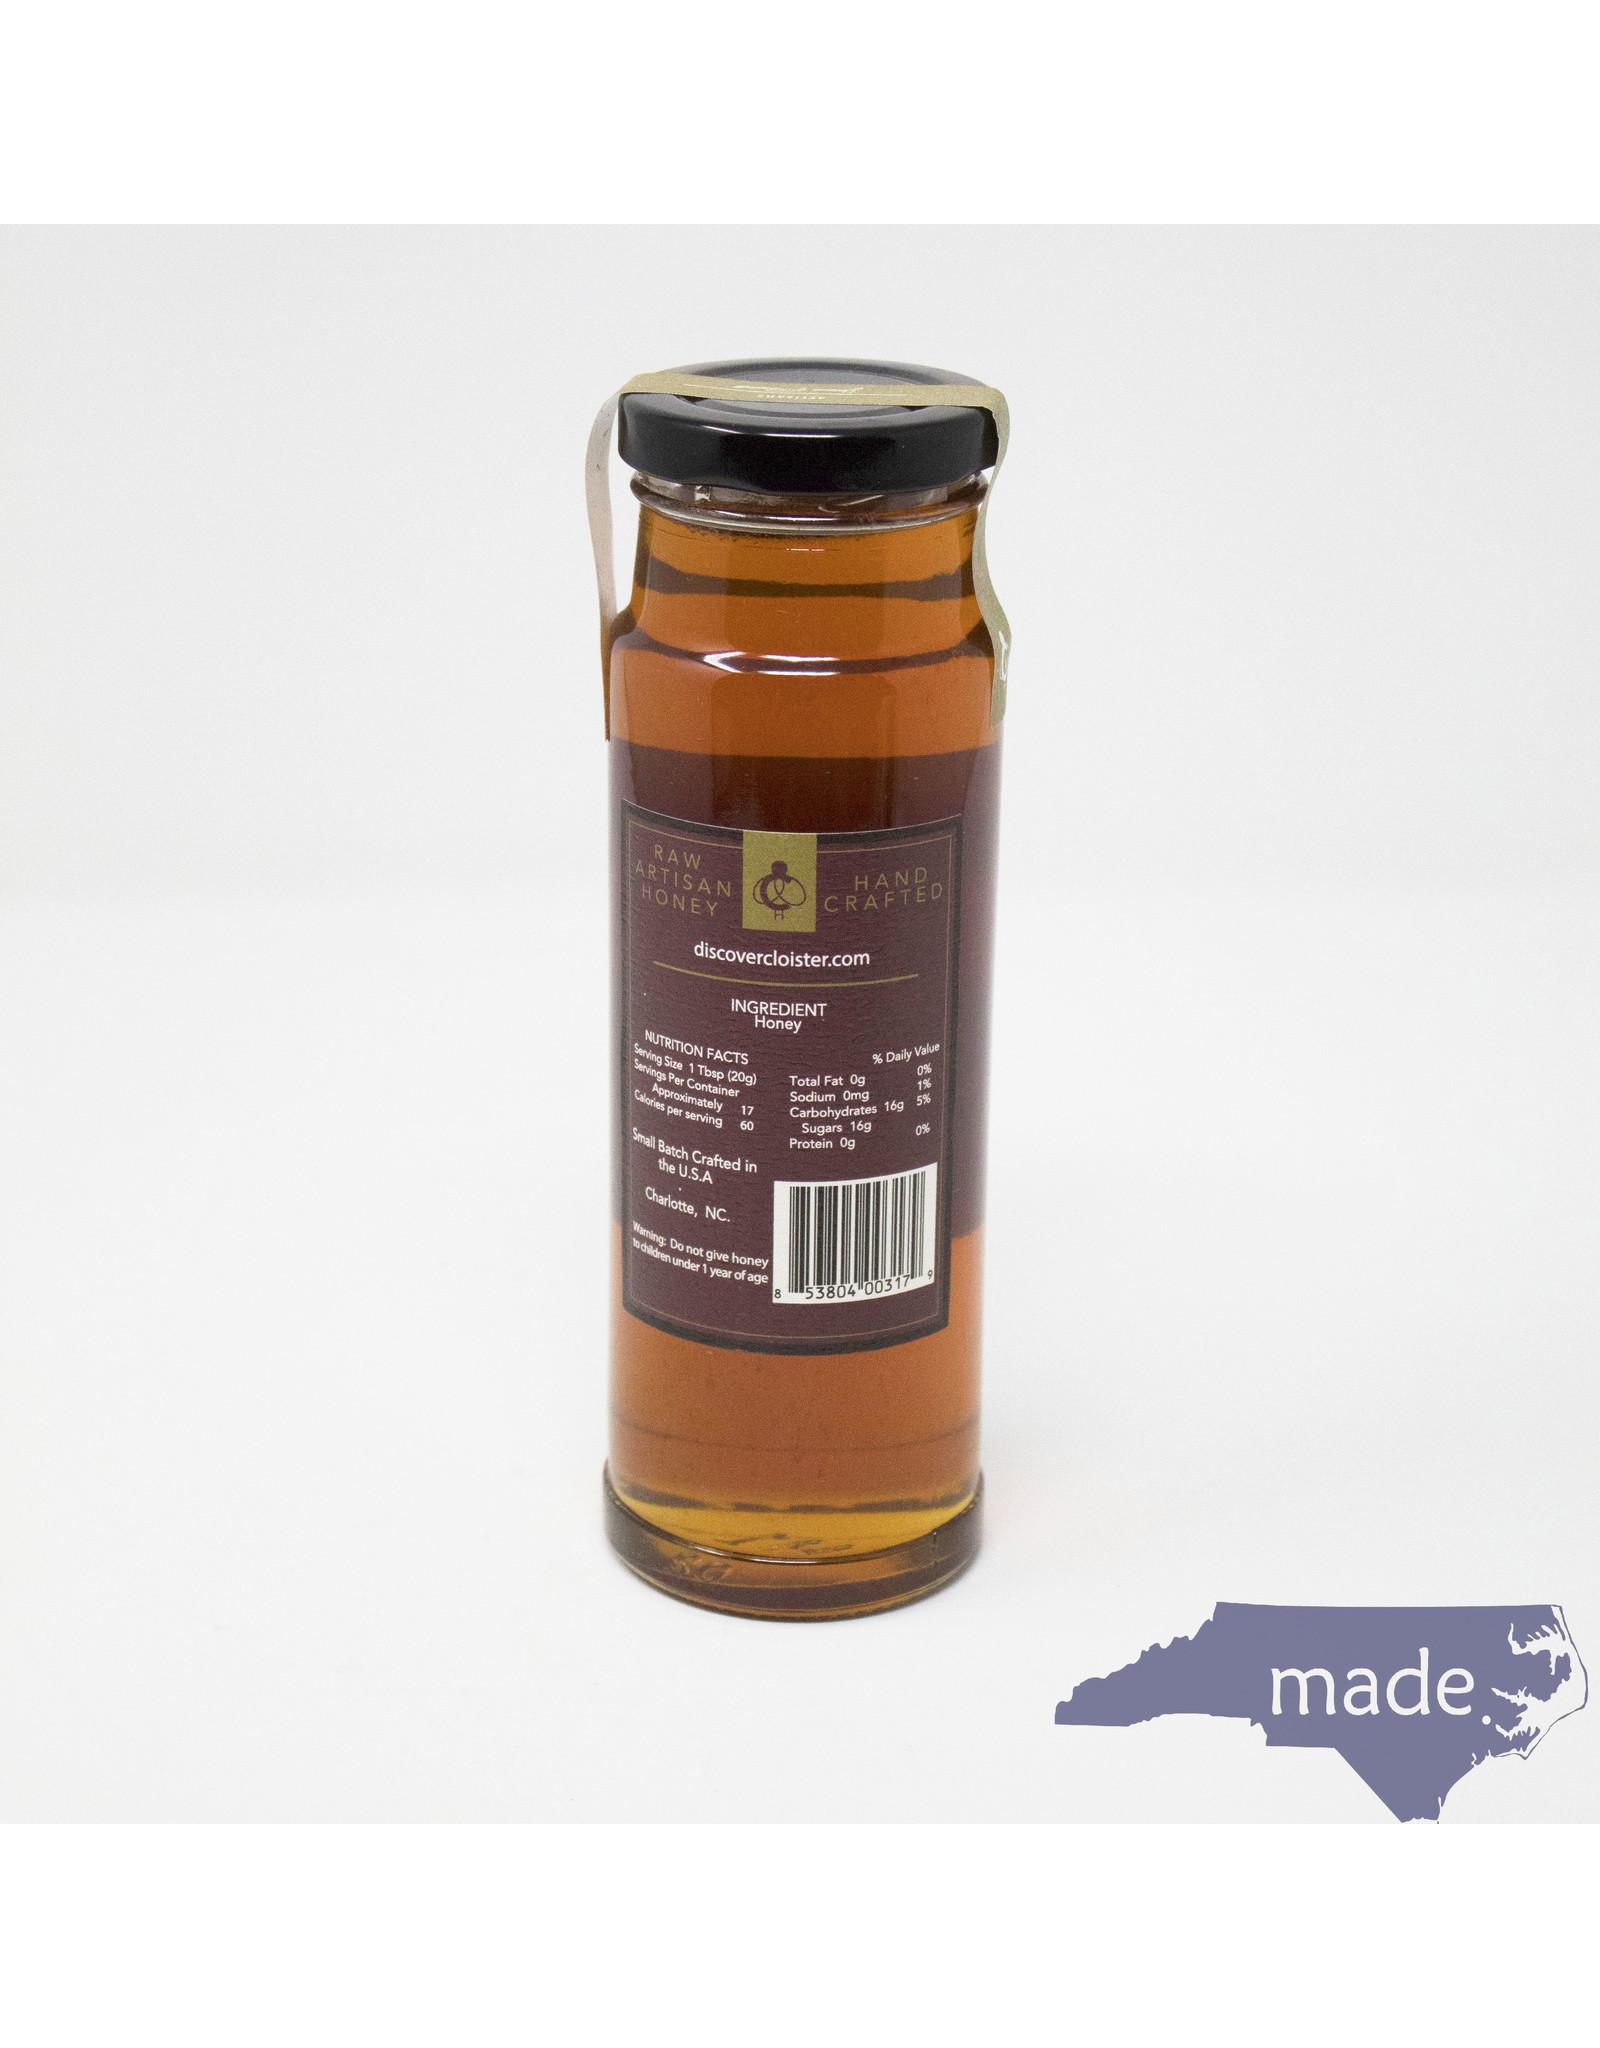 Cloister Honey Orange Blossom Honey 12 oz. - Cloister Honey